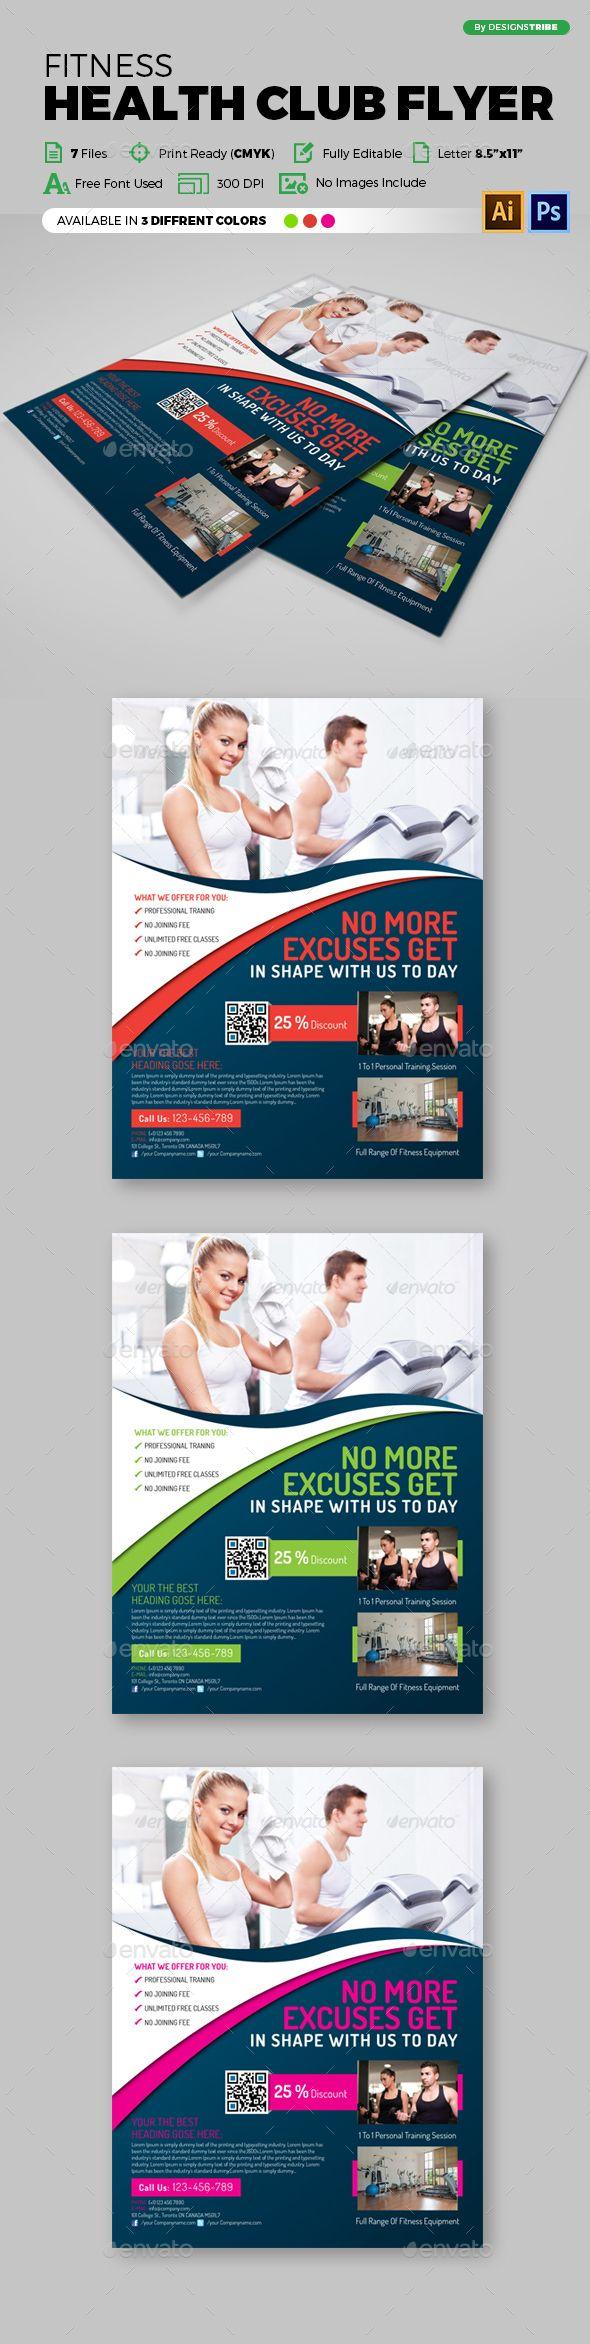 Free business flyers to print mersnoforum free business flyers to print flyer templates corporate free business template psd psdfreebies wajeb Choice Image